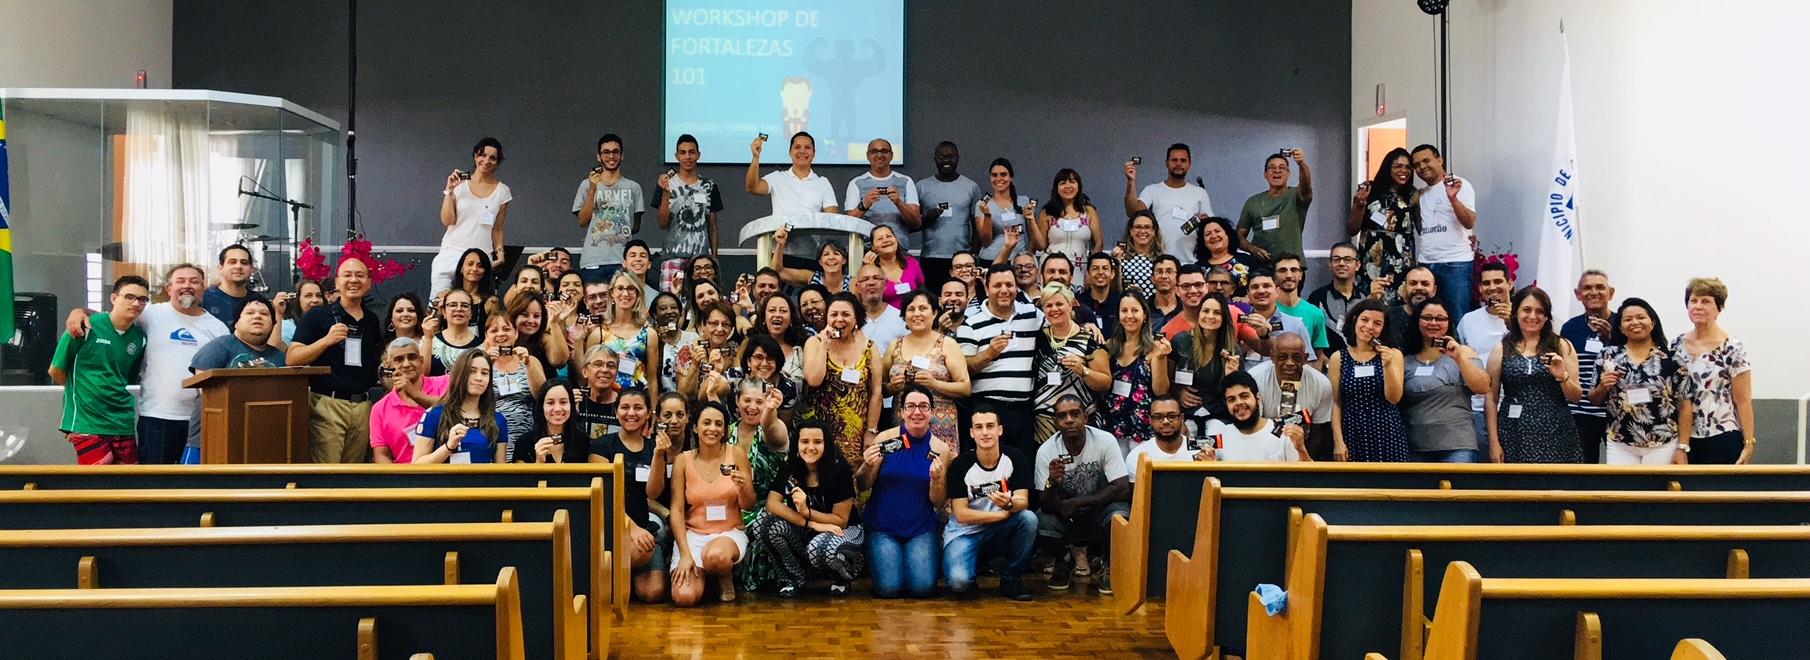 Workshop Fortalezas Nazarenas